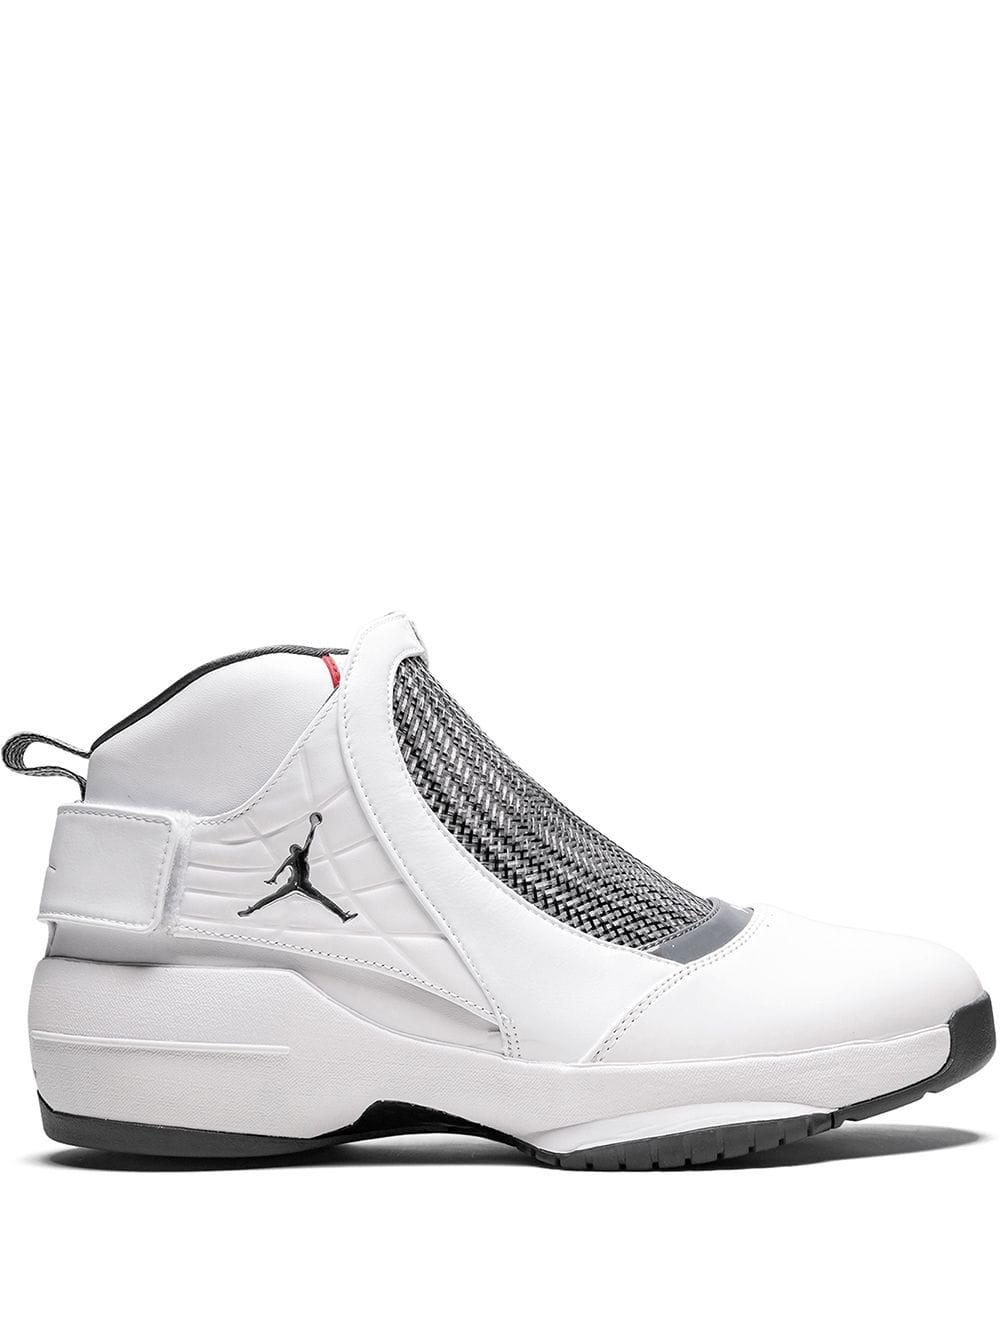 Jordan 19 Retro Sneakers In White